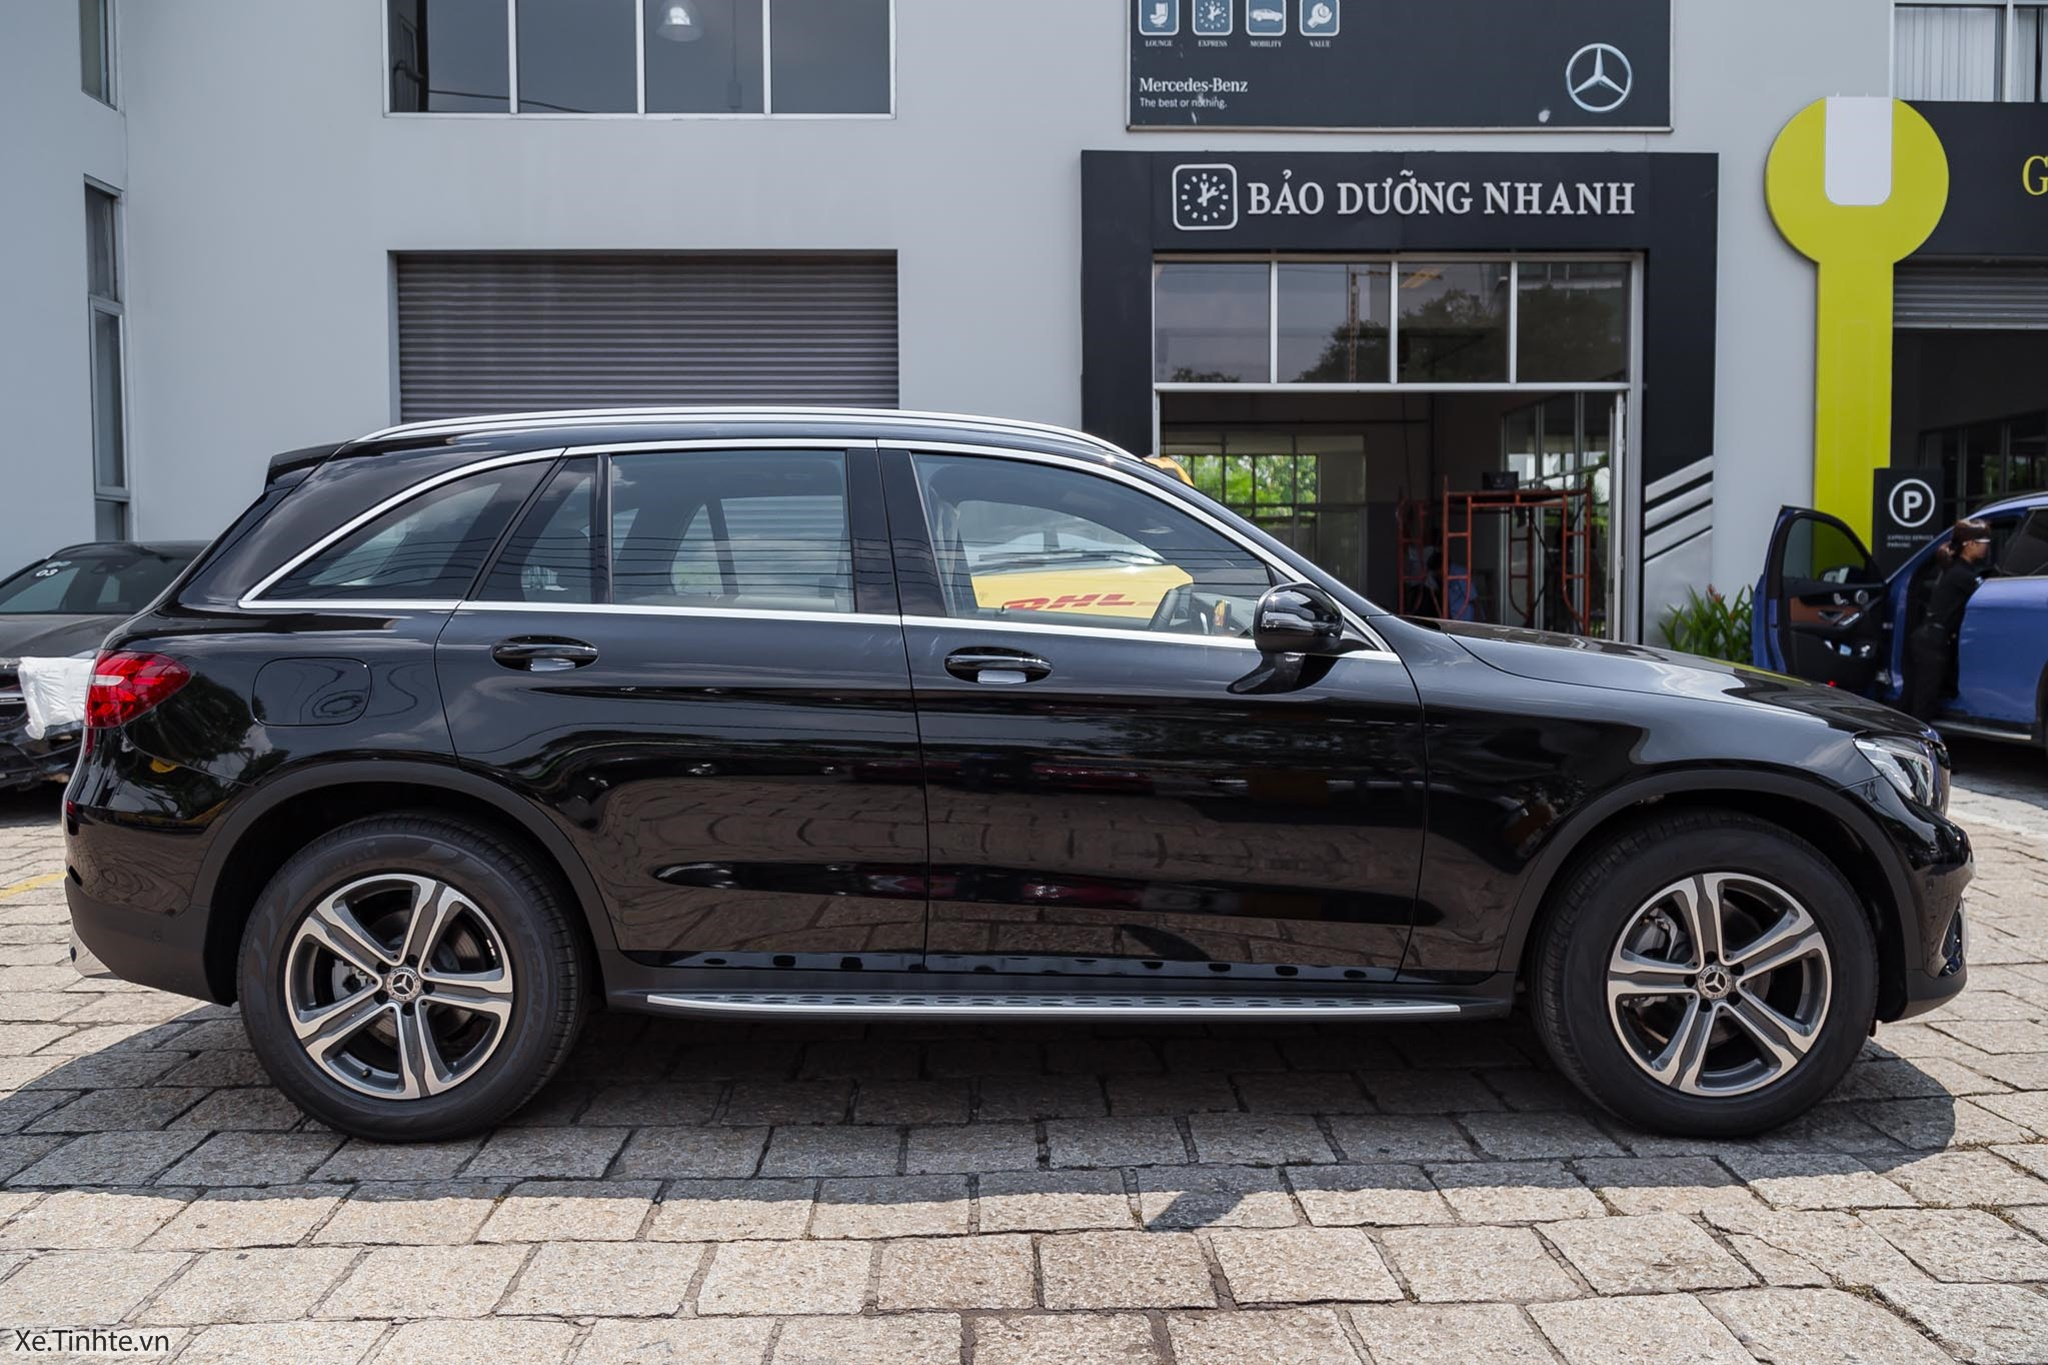 Mercedes_Benz_GLC_Class_2018_Xe_Tinhte-IMG_0749.jpg